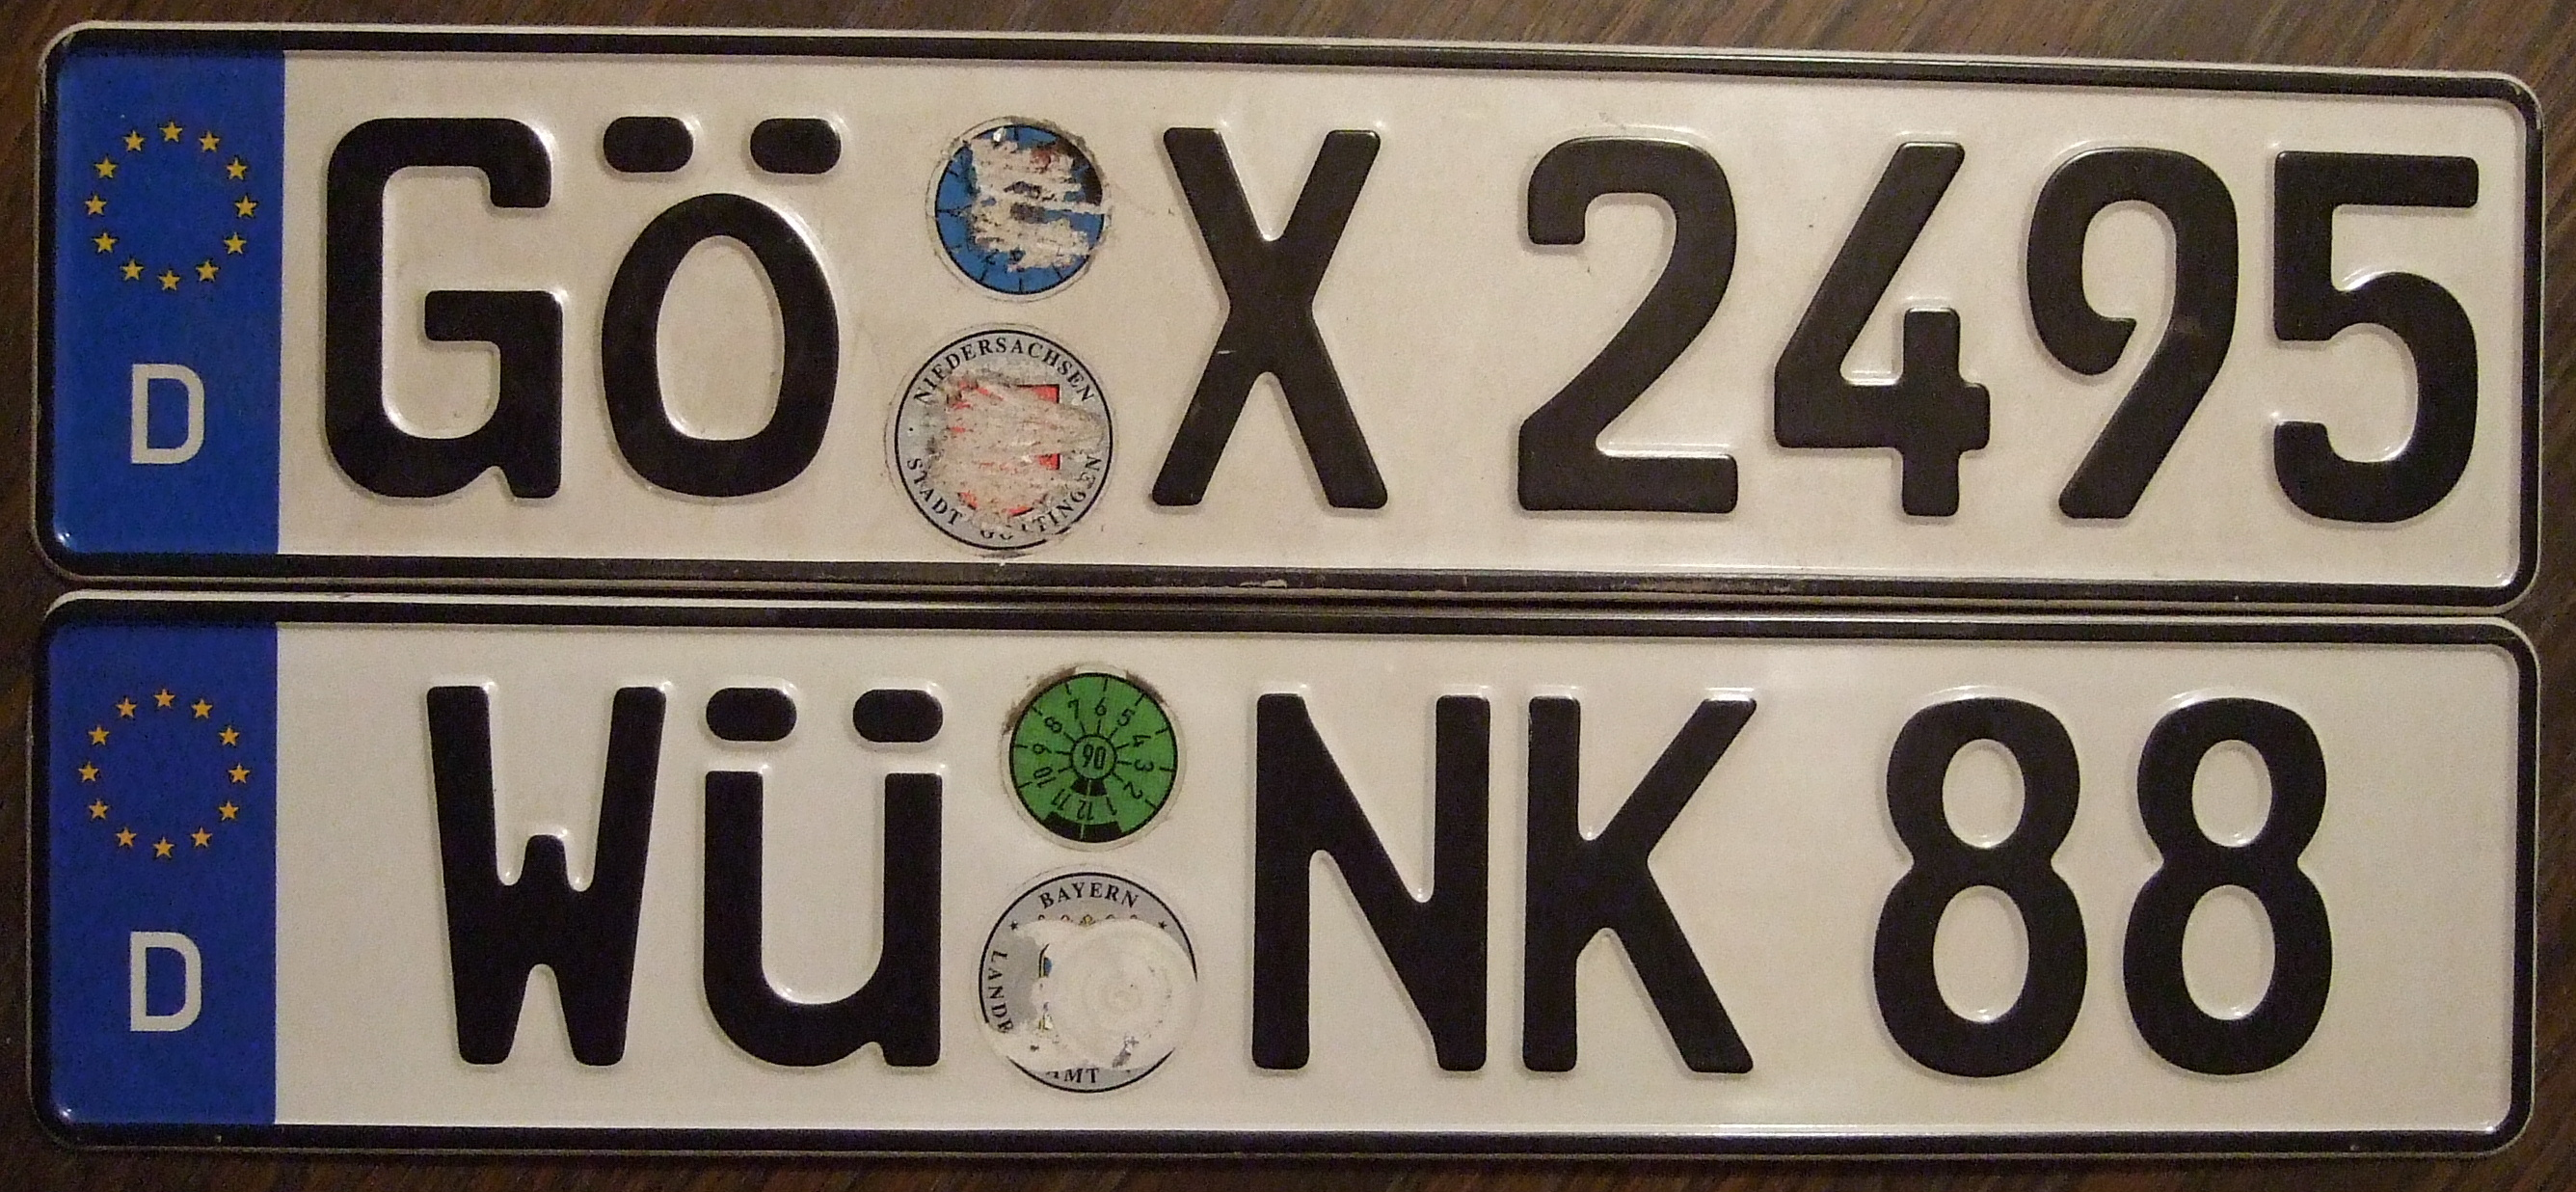 download car license plates search for free gurubackup. Black Bedroom Furniture Sets. Home Design Ideas